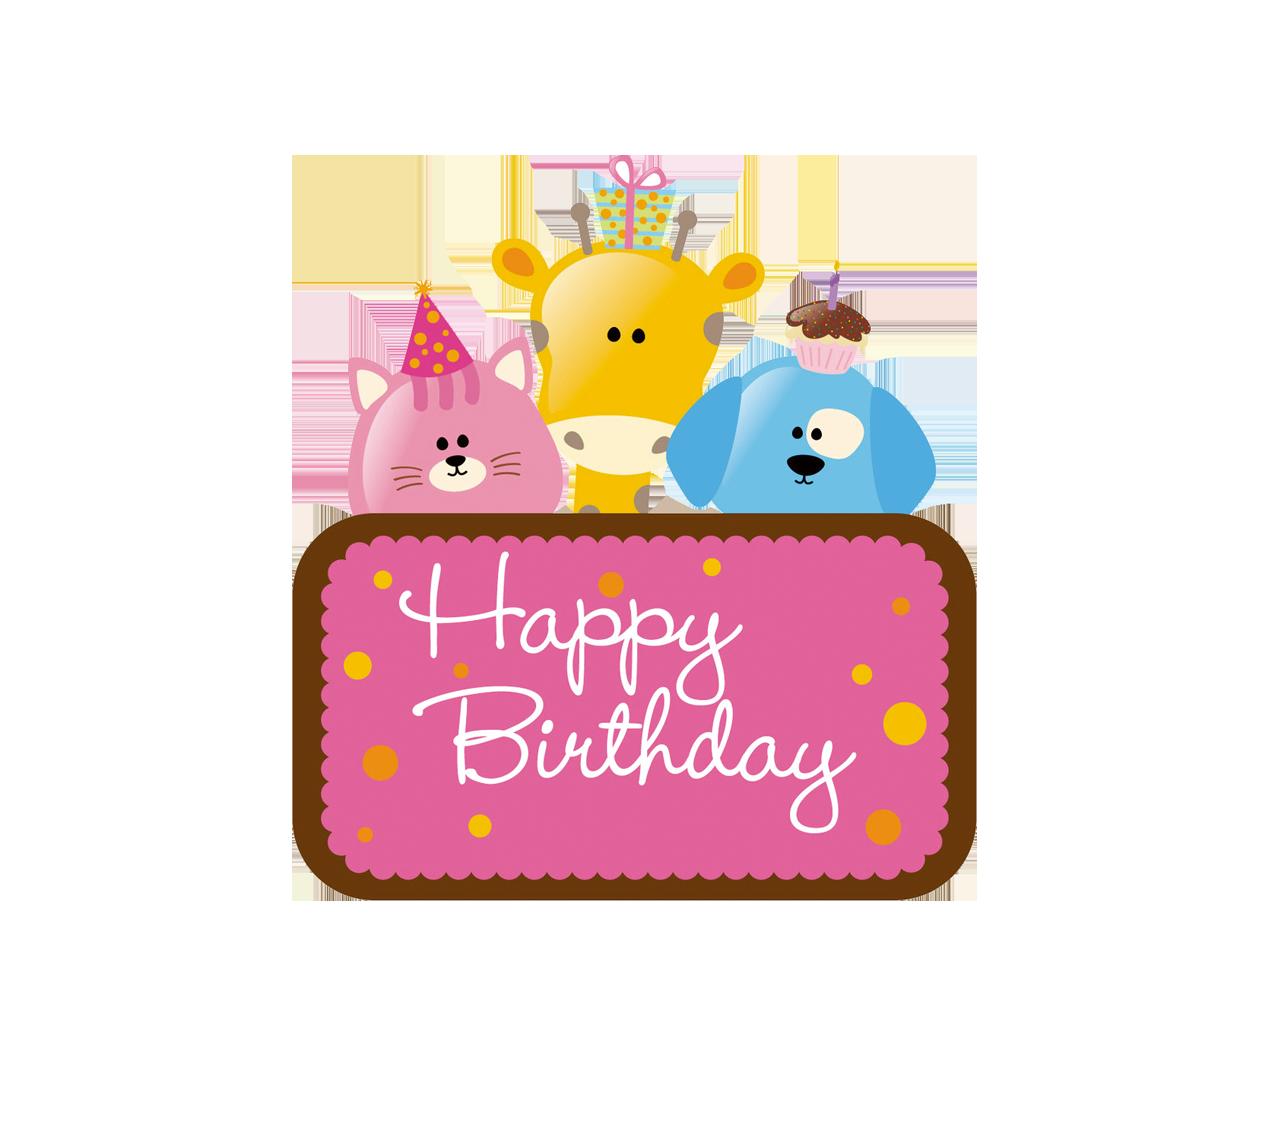 Label clipart wedding invitation. Birthday cake greeting card